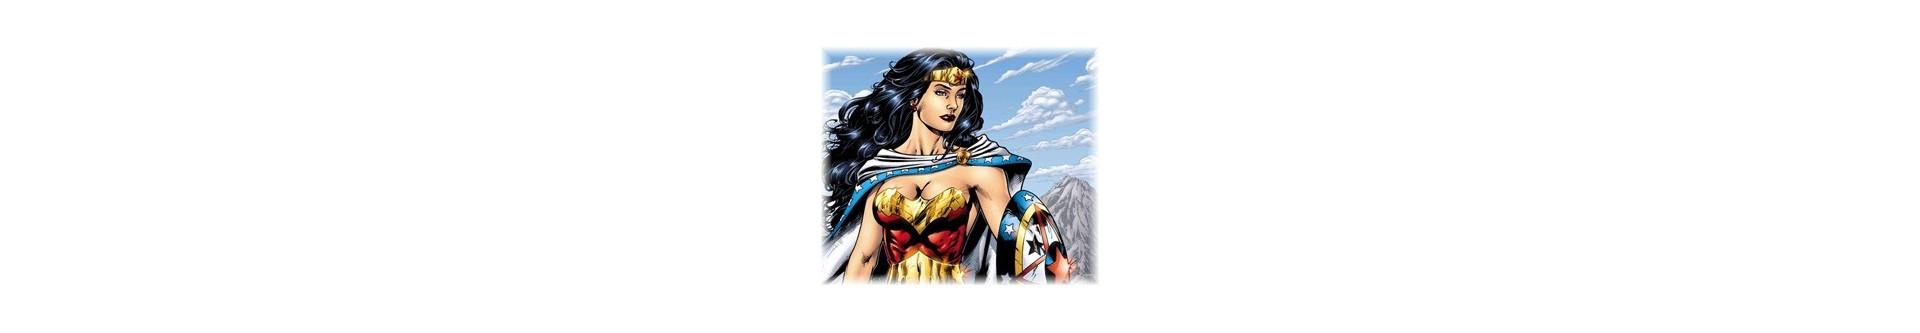 Bandes dessinées d'occasion | BD Super-héros